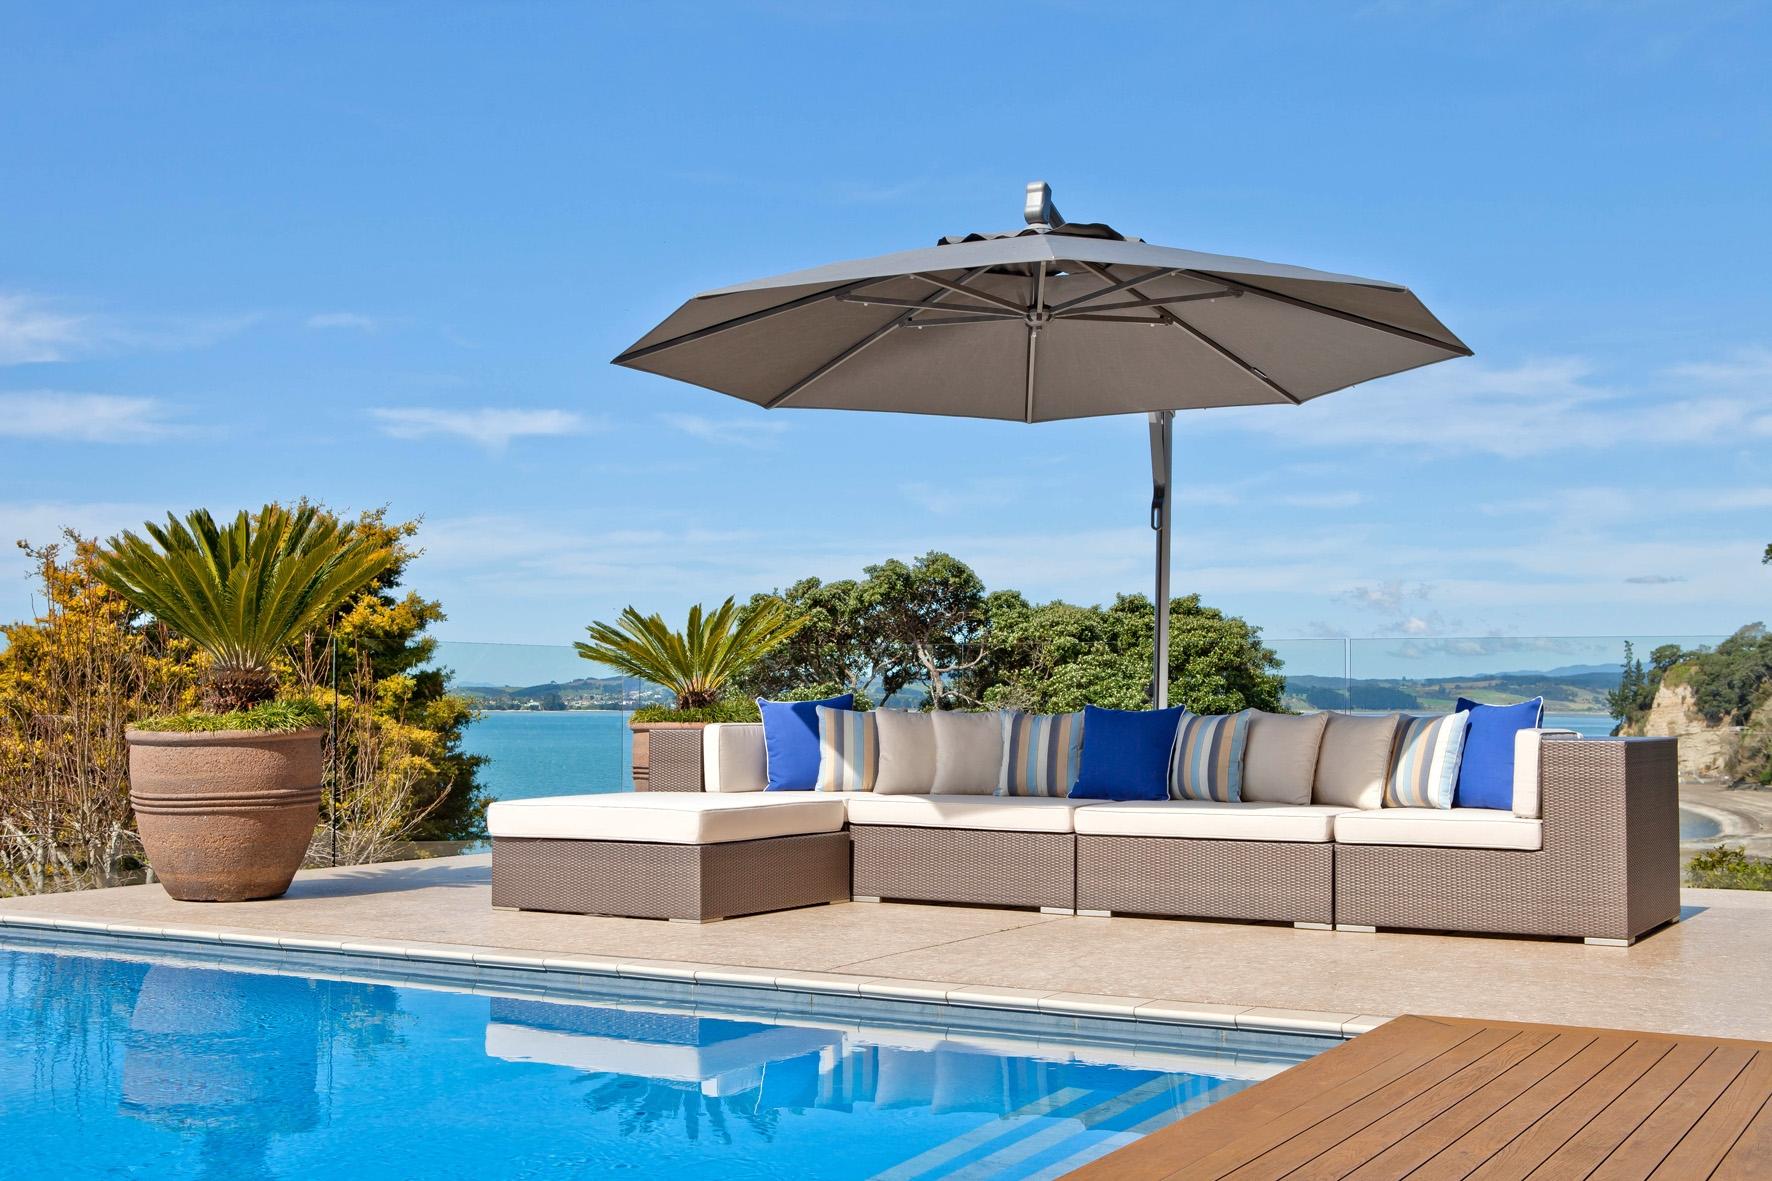 Horizon cantilever umbrella in Cockle Bay